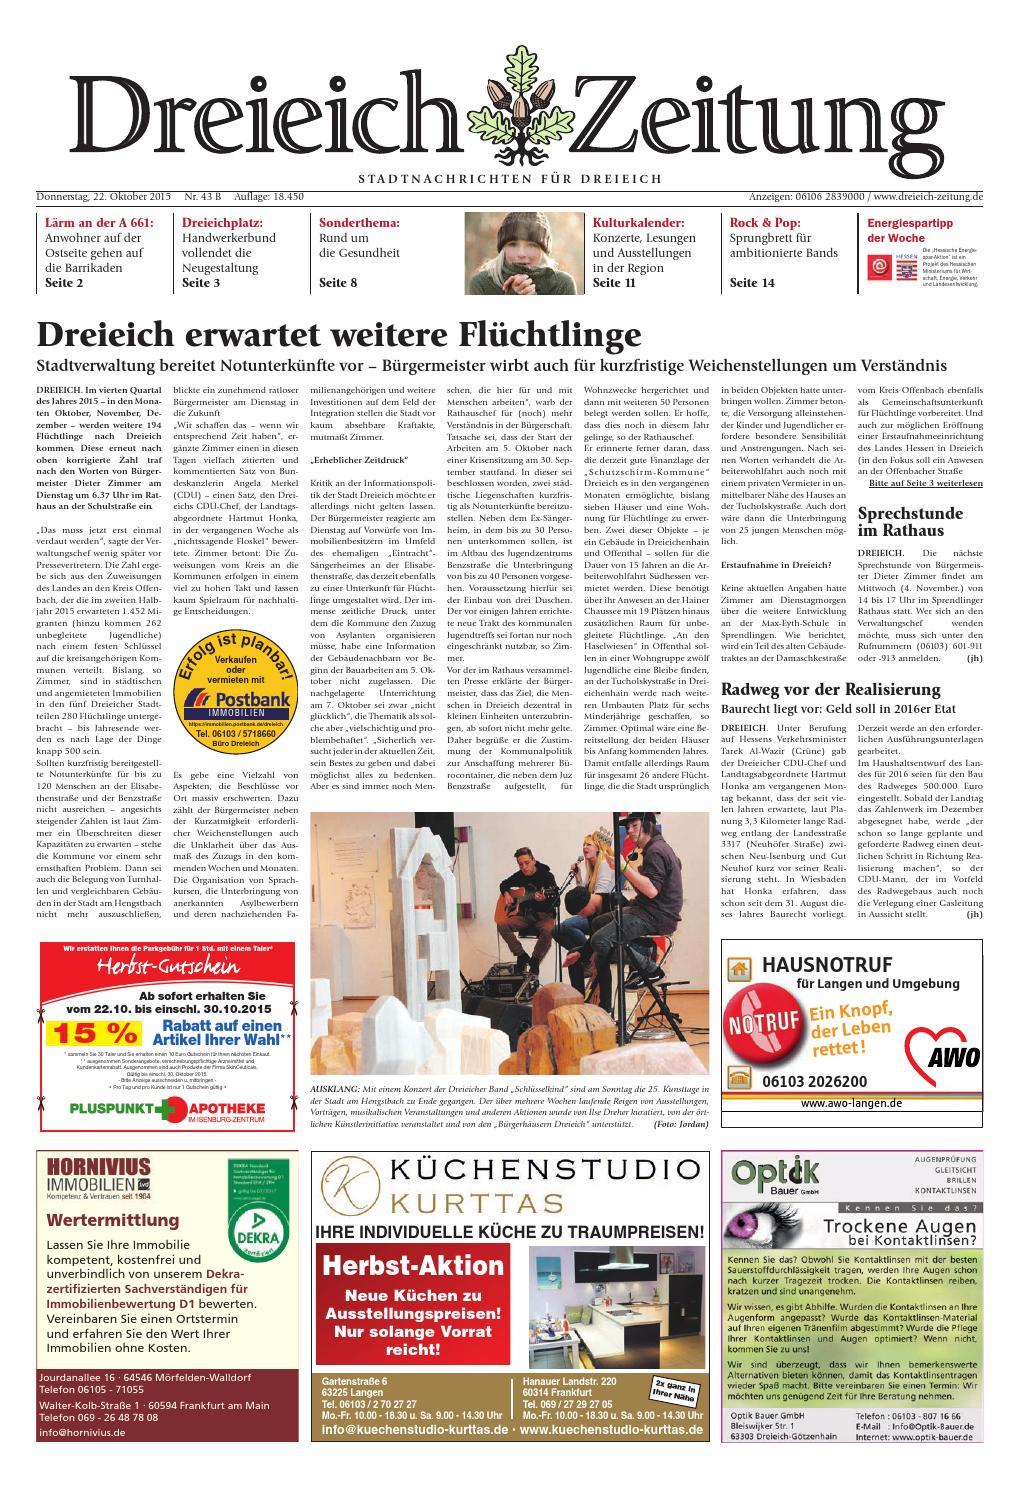 san francisco 4b24c 33dd9 Dz online 043 15 b by Dreieich-Zeitung Offenbach-Journal - issuu